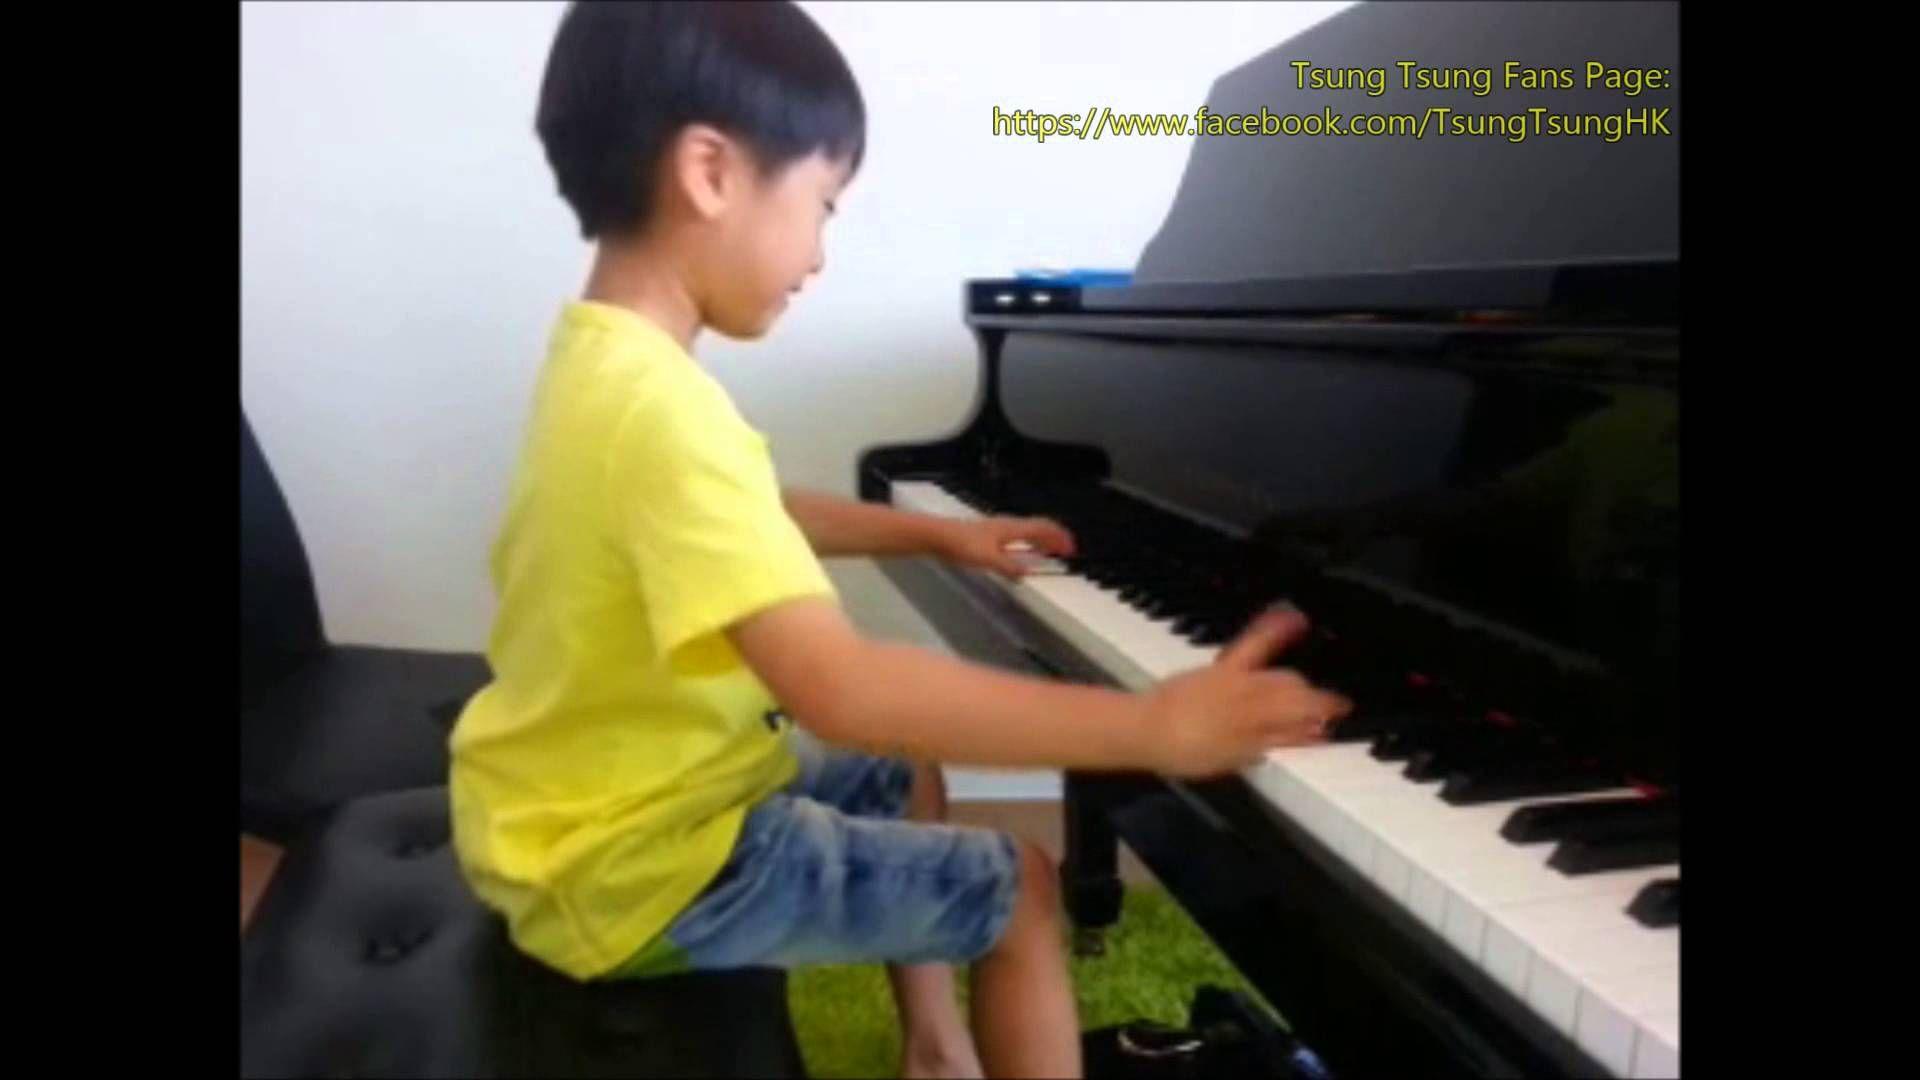 Piano Prodigy Tsung Tsung plays bumblebee - YouTube